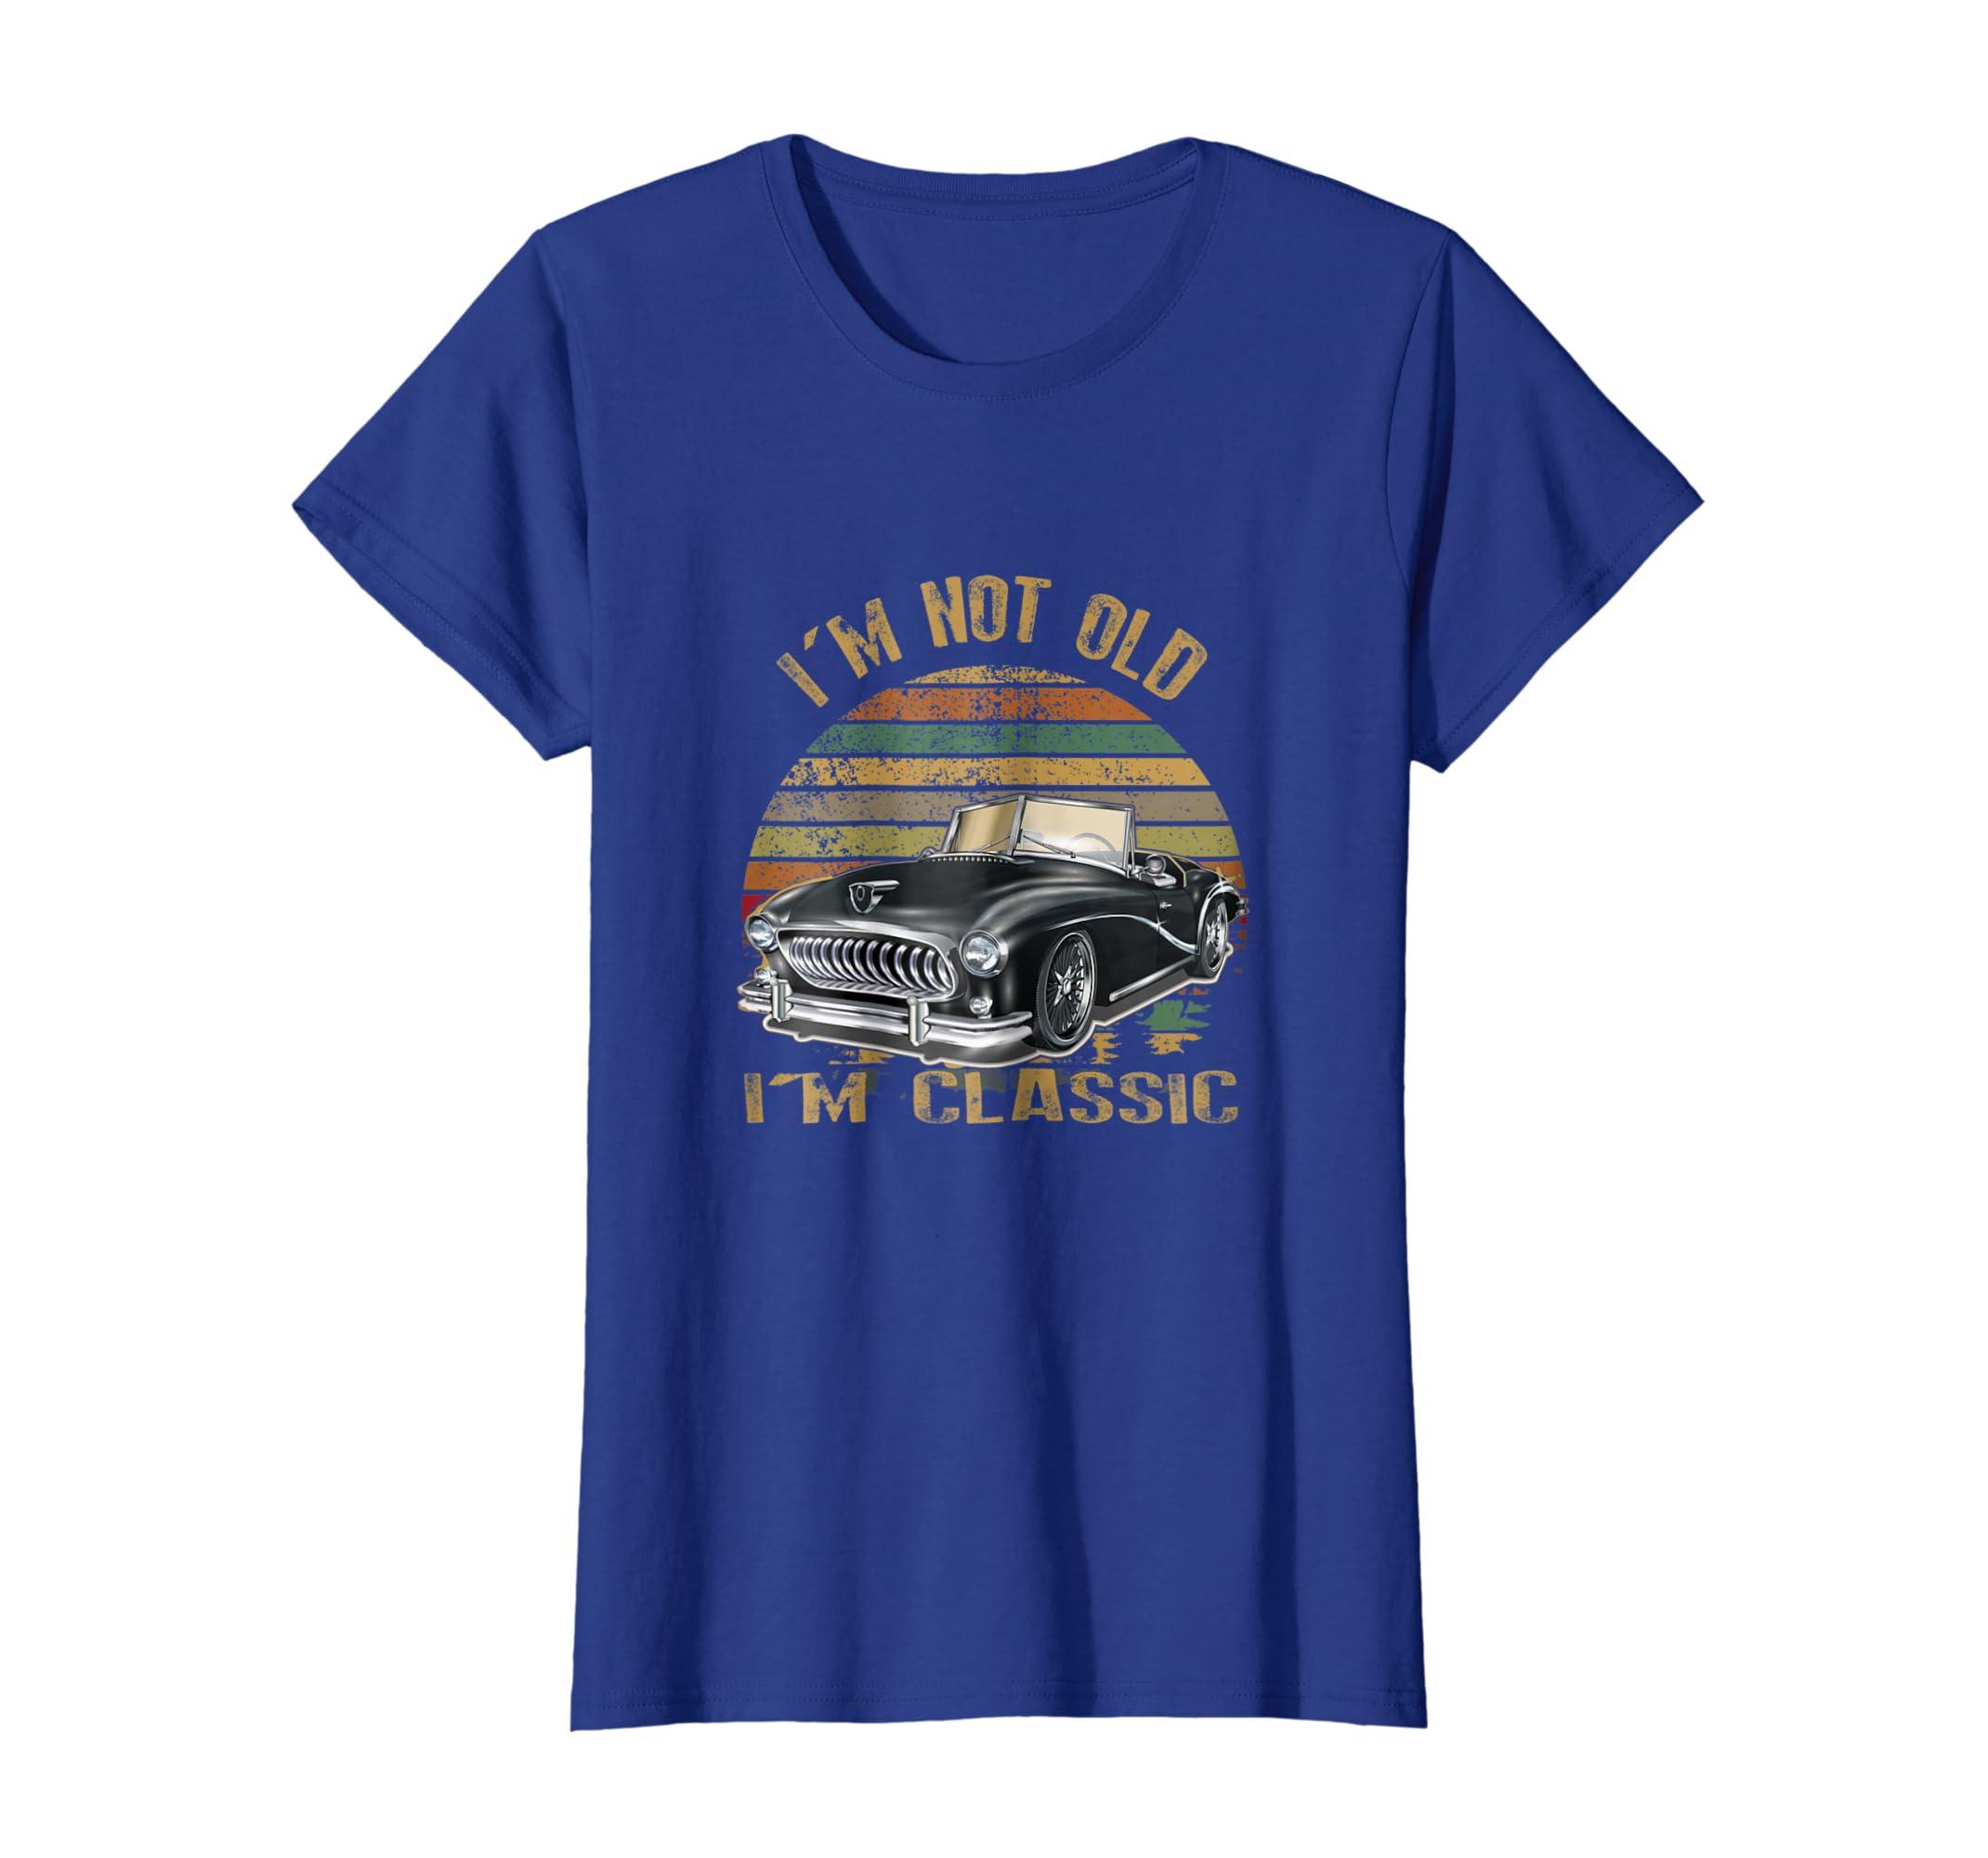 fe19f95b Amazon.com: I'm not old I'm classic car funny Retro Car t-shirt: Clothing